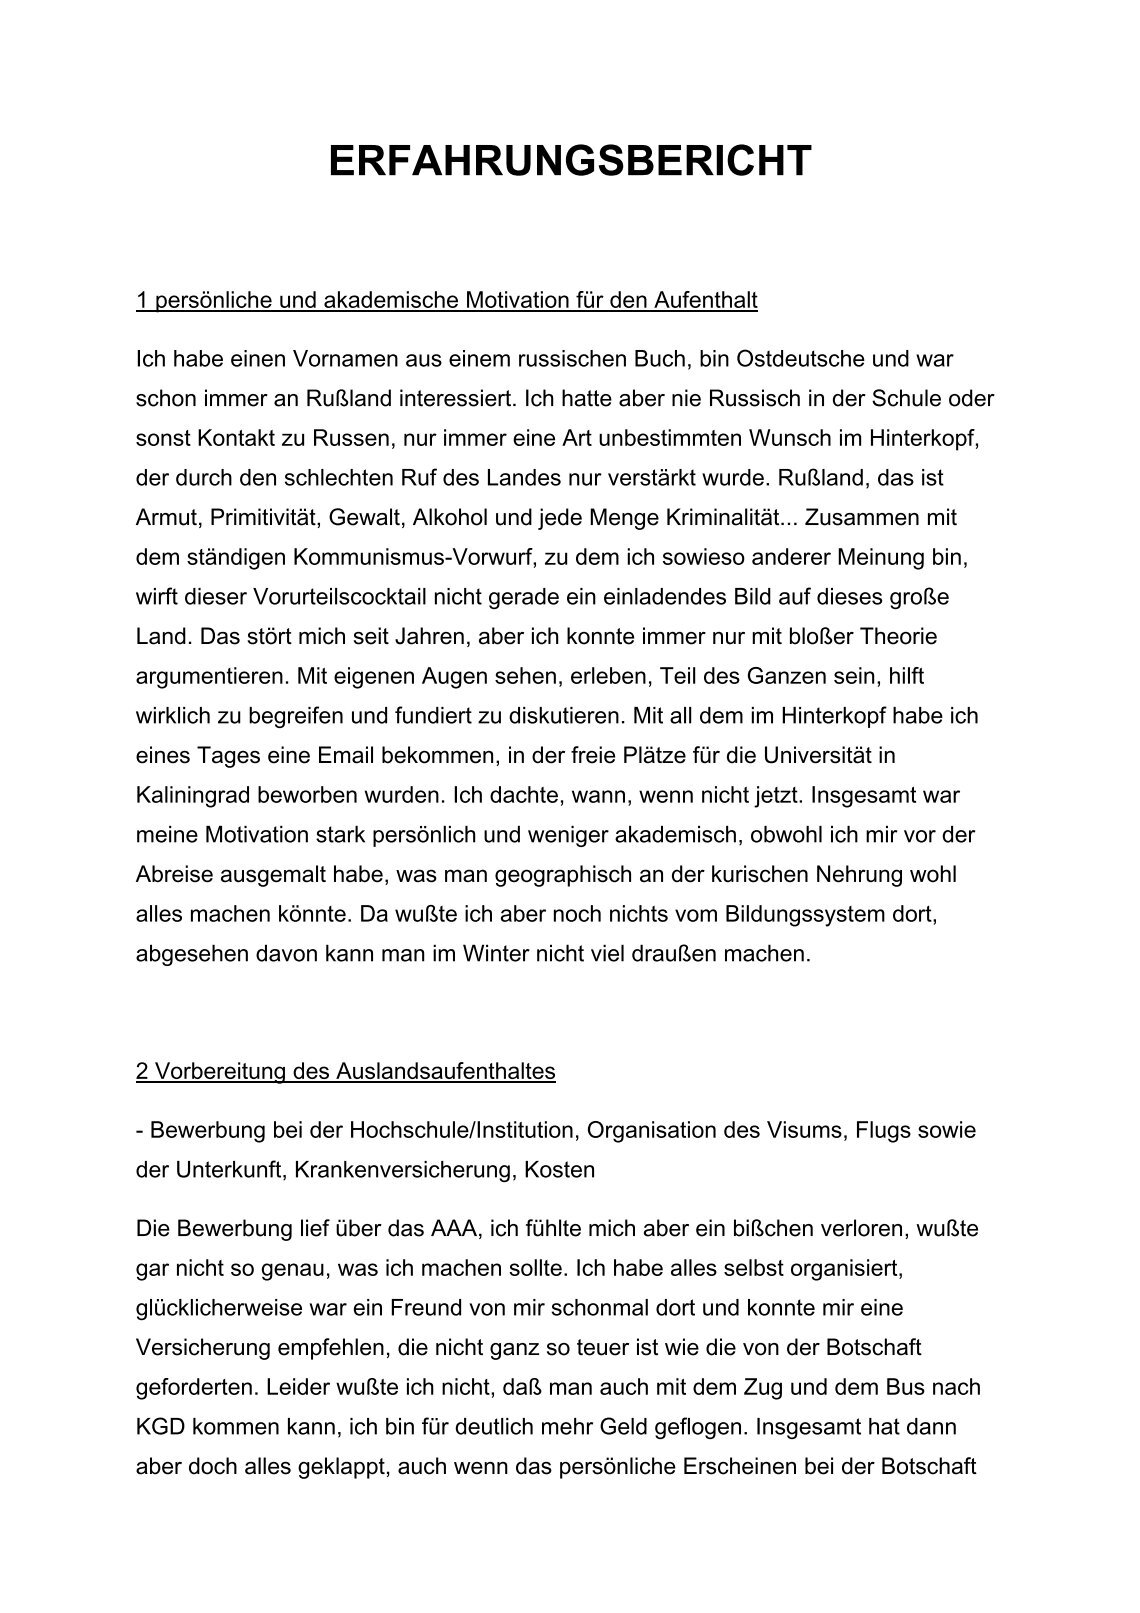 unigreifswaldde - Uni Greifswald Bewerbung